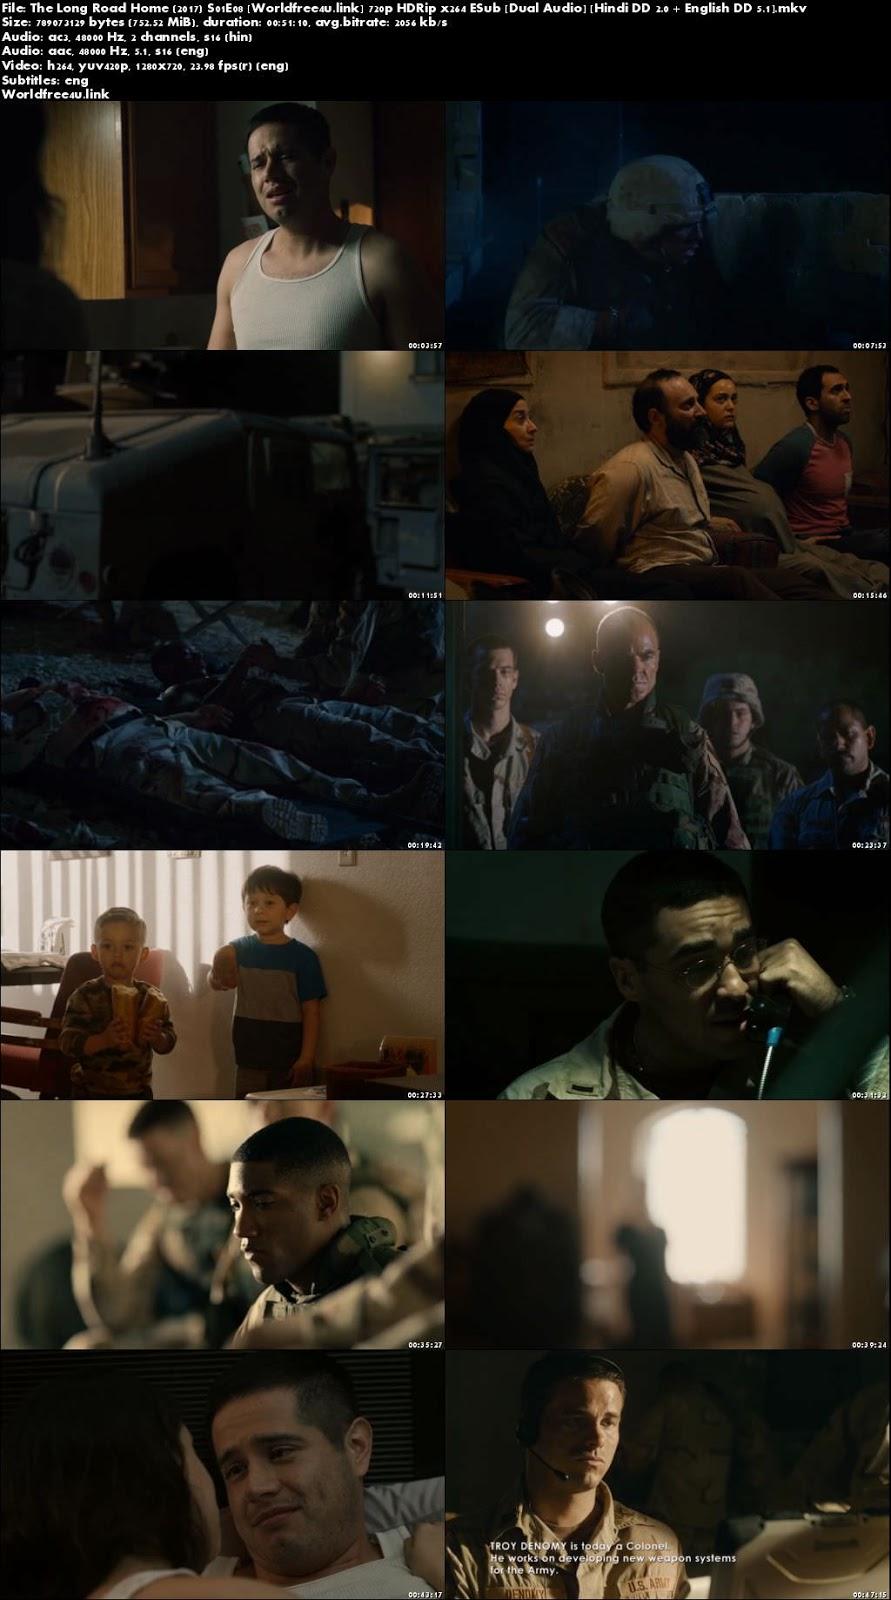 Screen Shoot of The Long Road Home 2017 S01E08 HDRip 720p Dual Audio Hindi English ESub